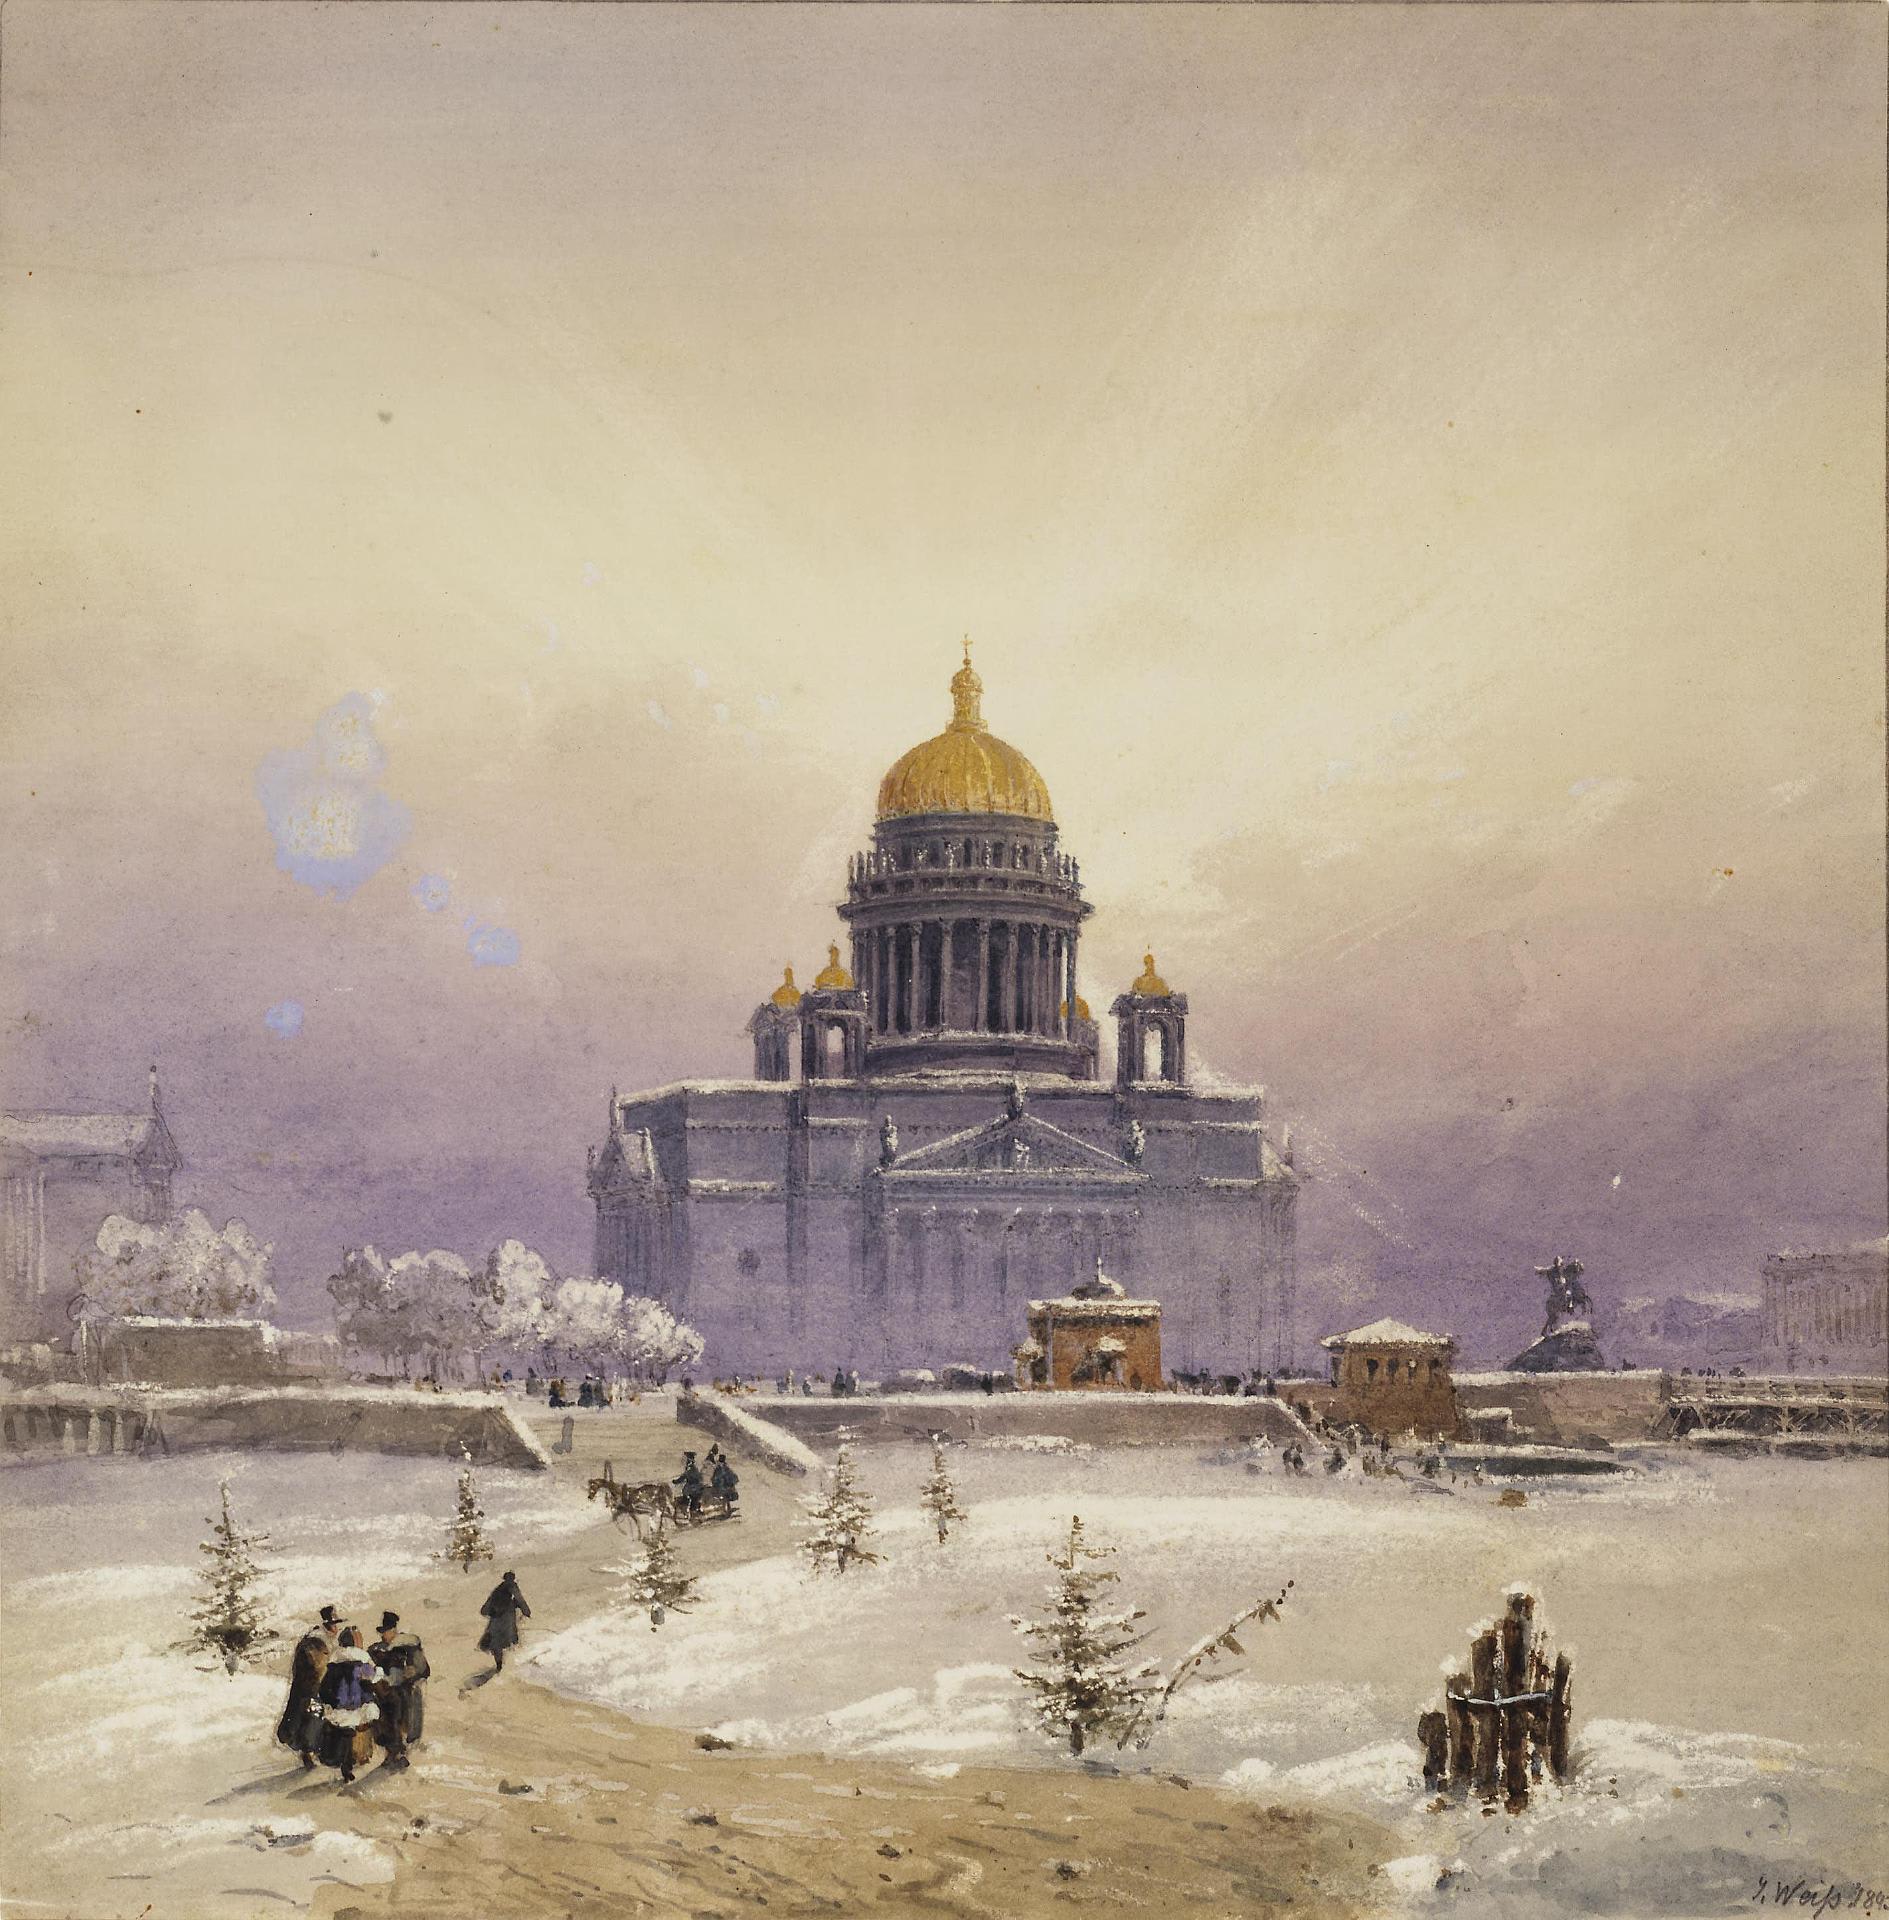 Санкт-Петербург, Исаакиевский собор, 1843 год. Художник Joseph Andreas Weiss